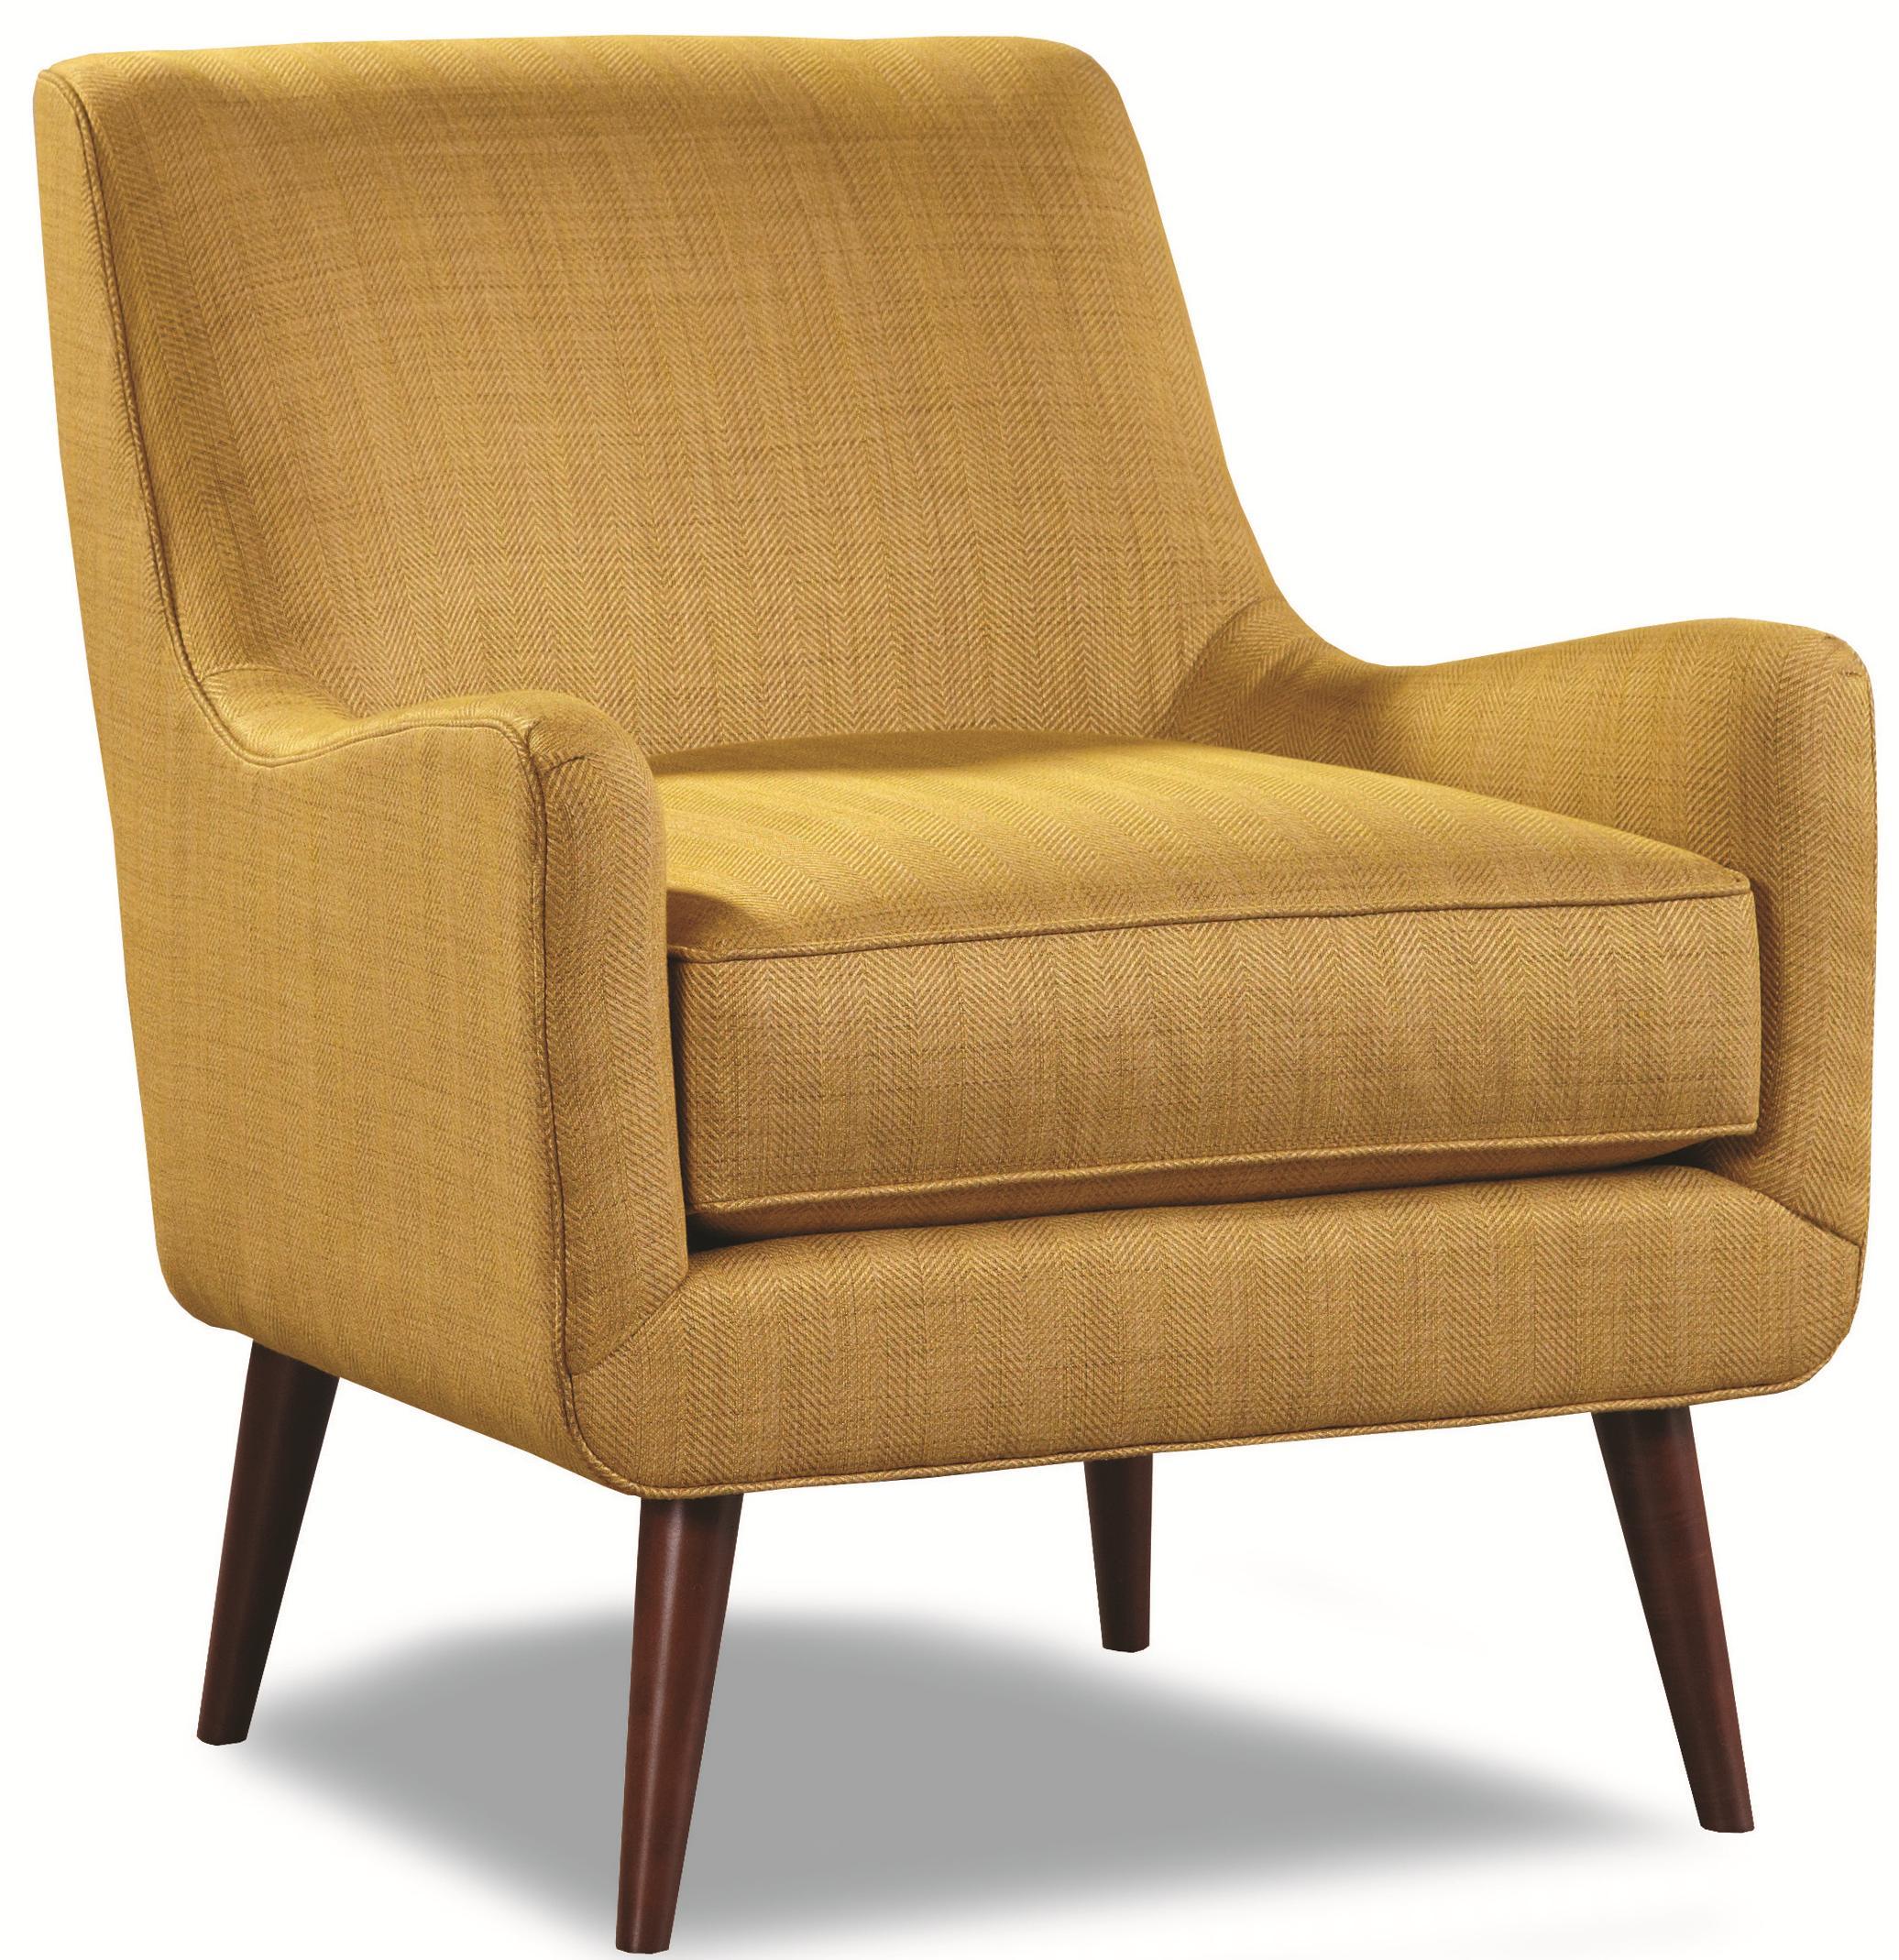 7470 Upholstered Chair by Geoffrey Alexander at Sprintz Furniture